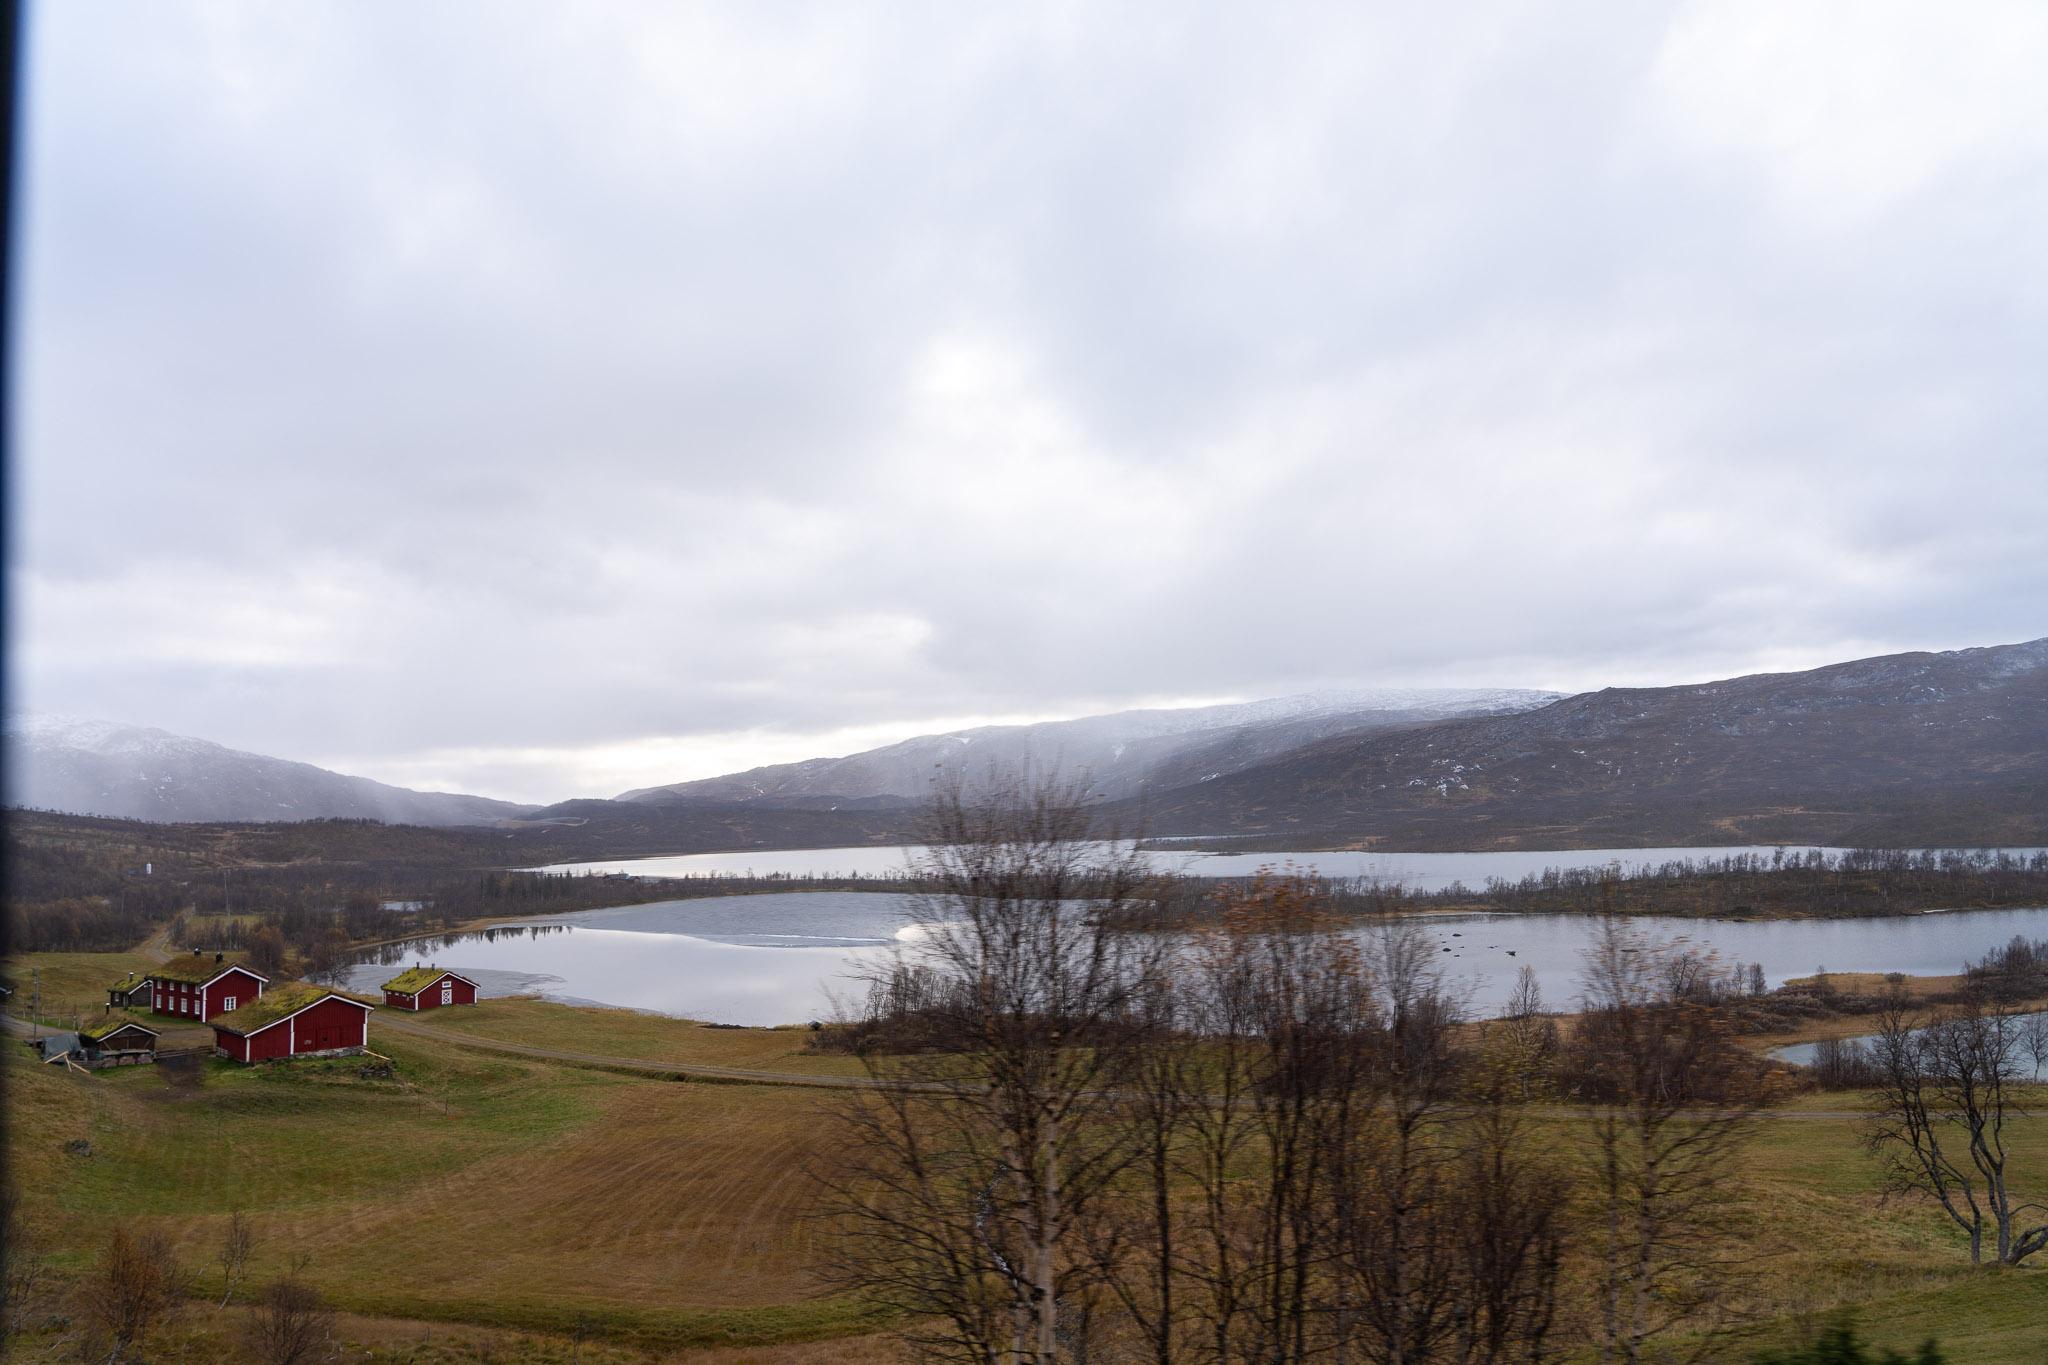 halb zugefrorene Seen